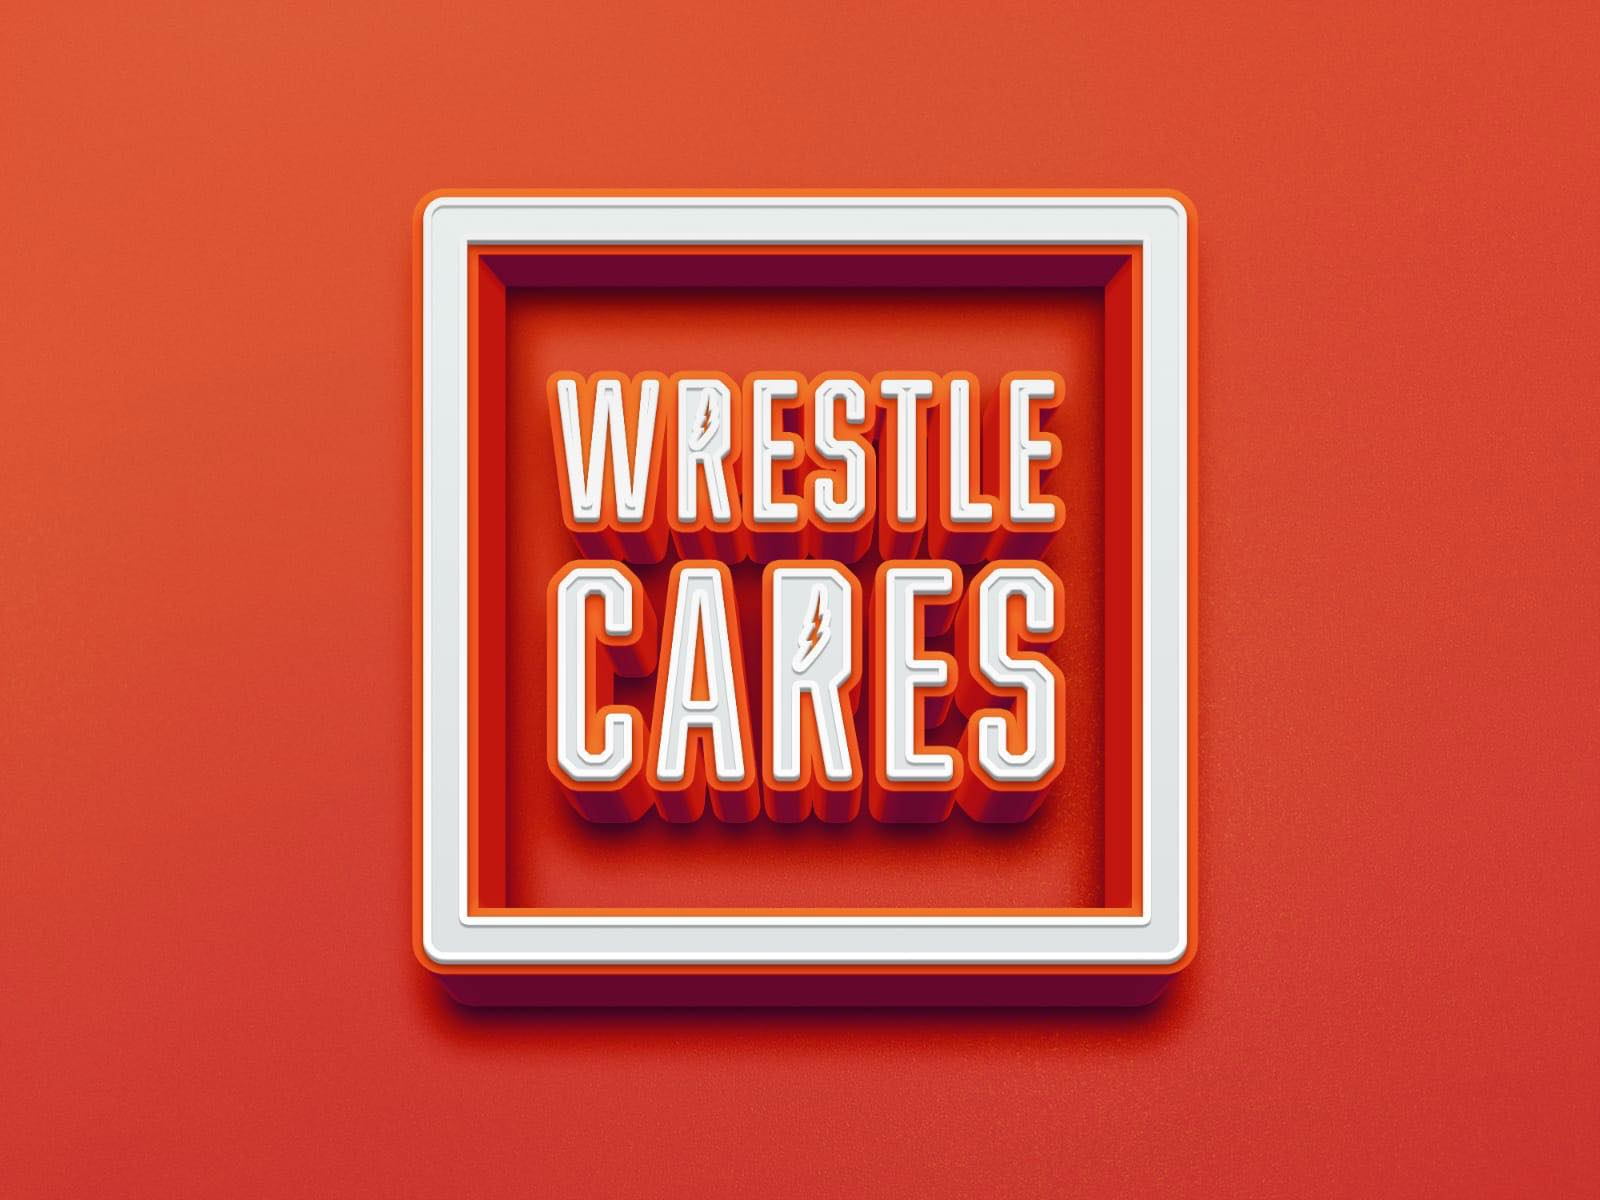 Wrestle Cares